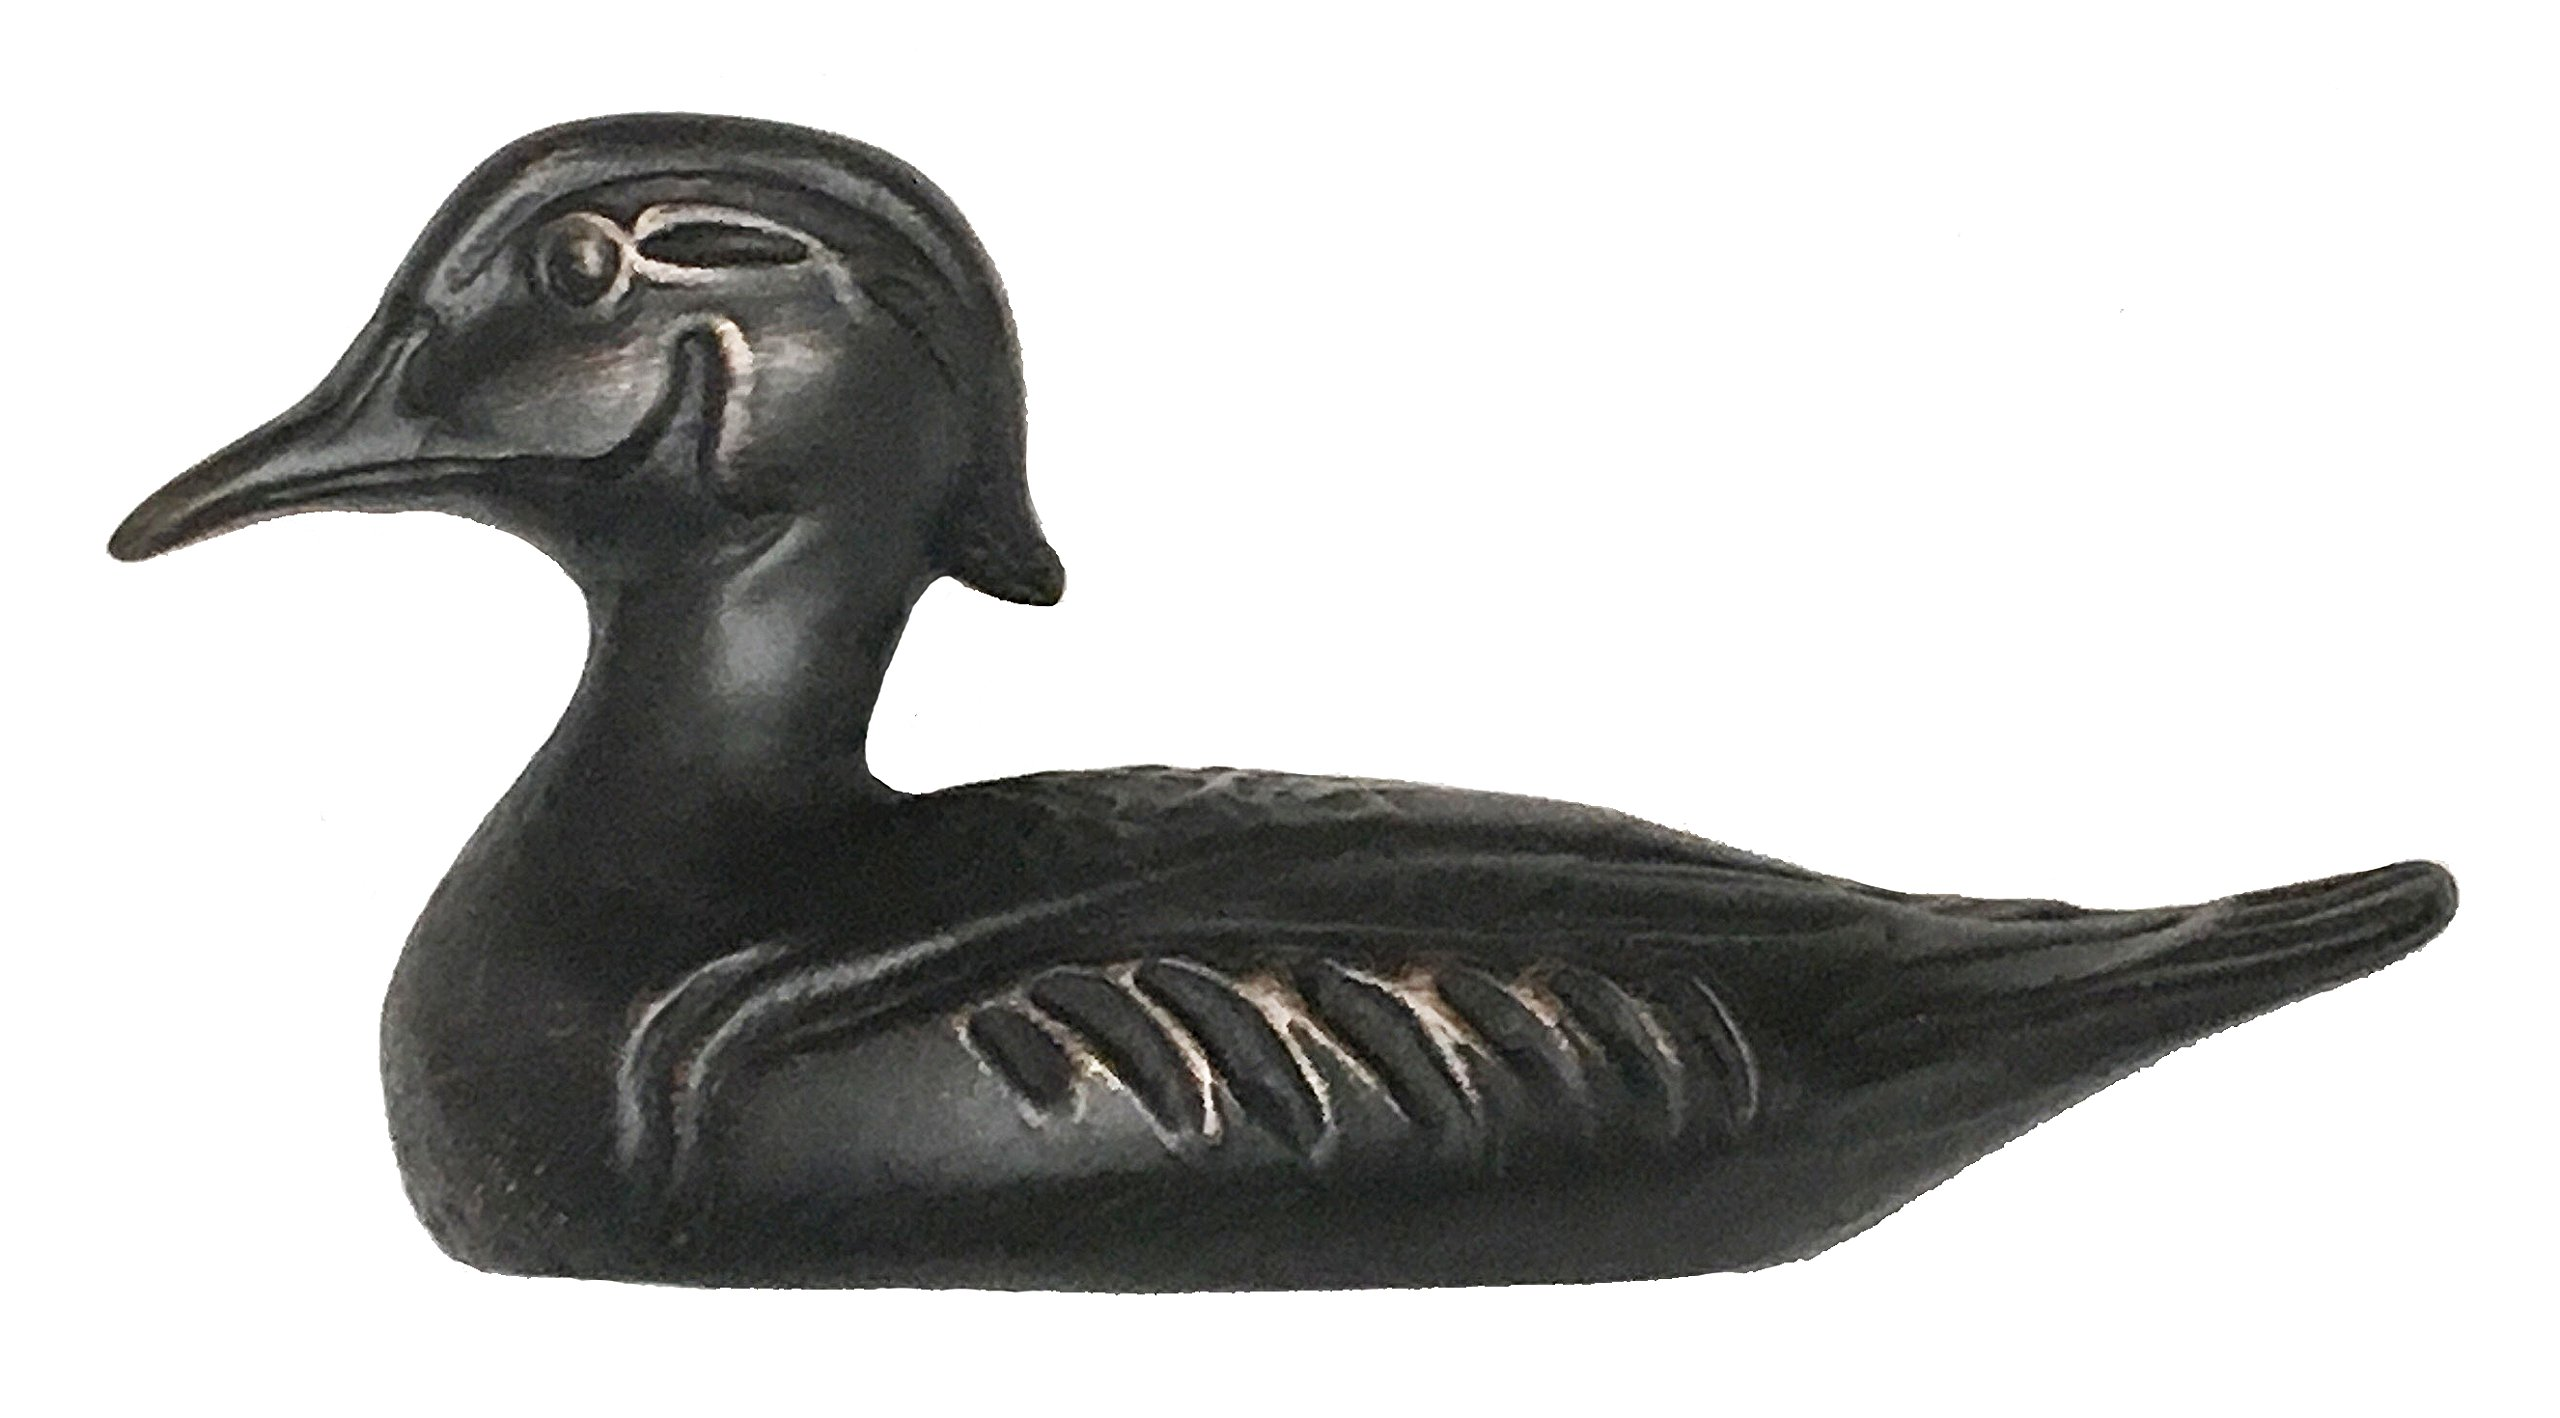 D'Artefax DHP93-Orb Duck Decoy Pull (Left Facing) Decorative Cabinets, Oil Rub Bronze